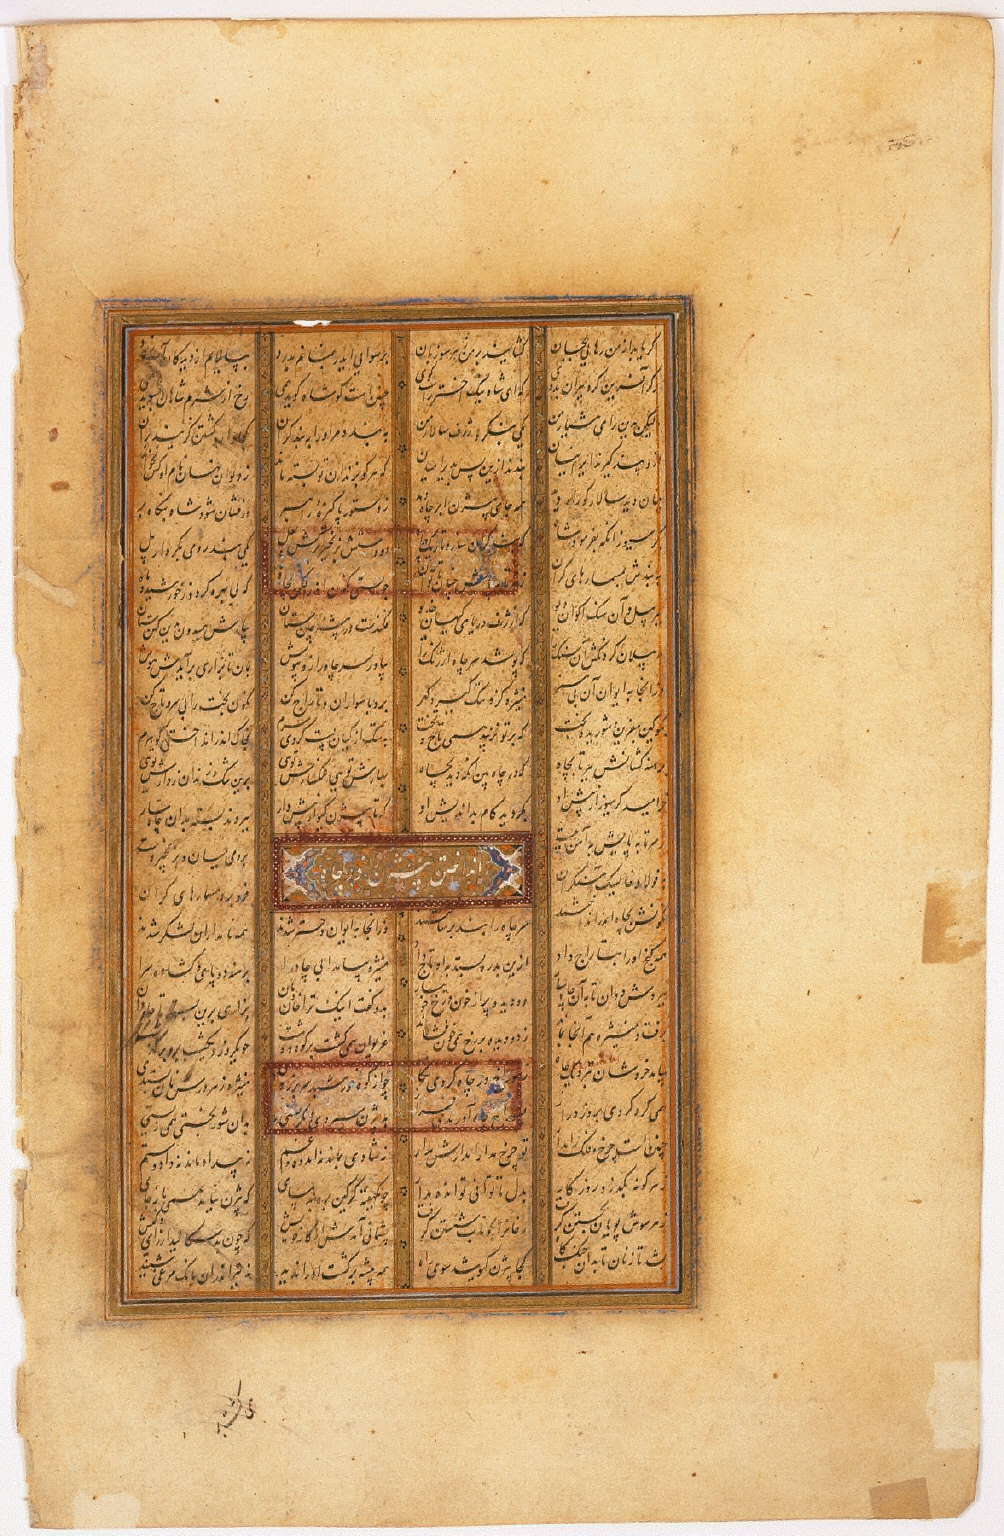 Firdawsi's Shah-Nama